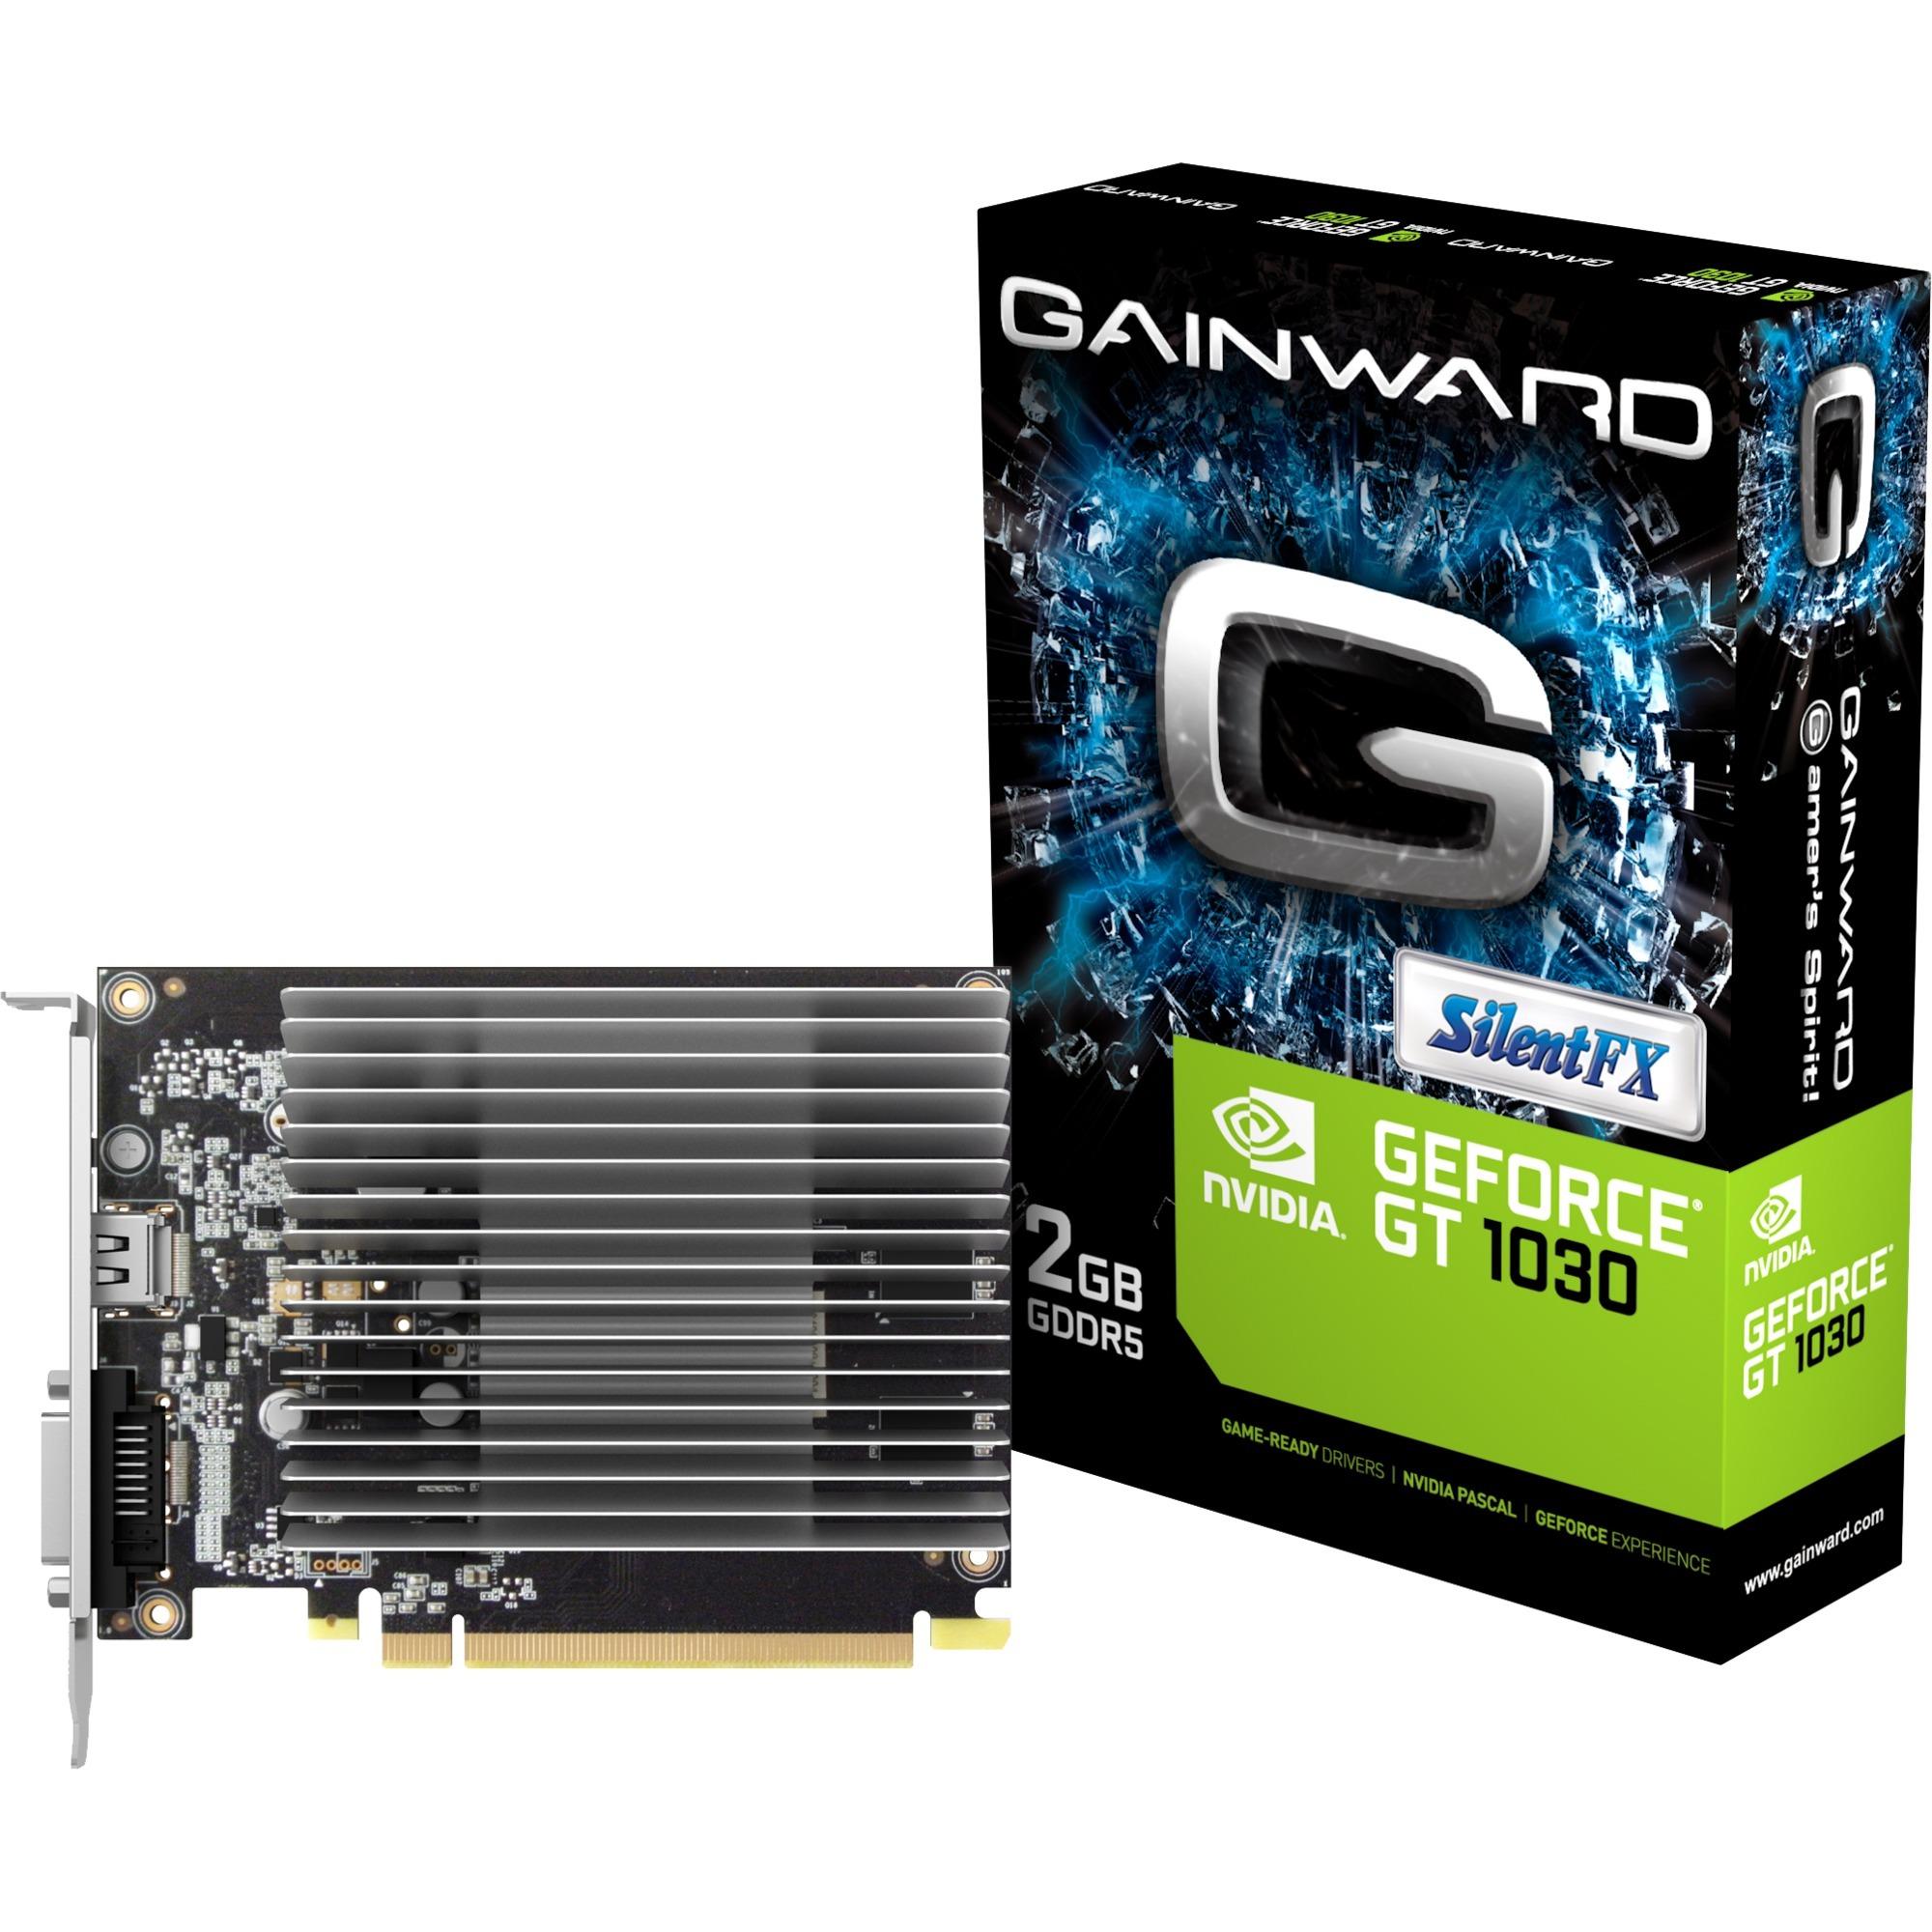 426018336-3927 GeForce GT 1030 2GB GDDR5, Tarjeta gráfica